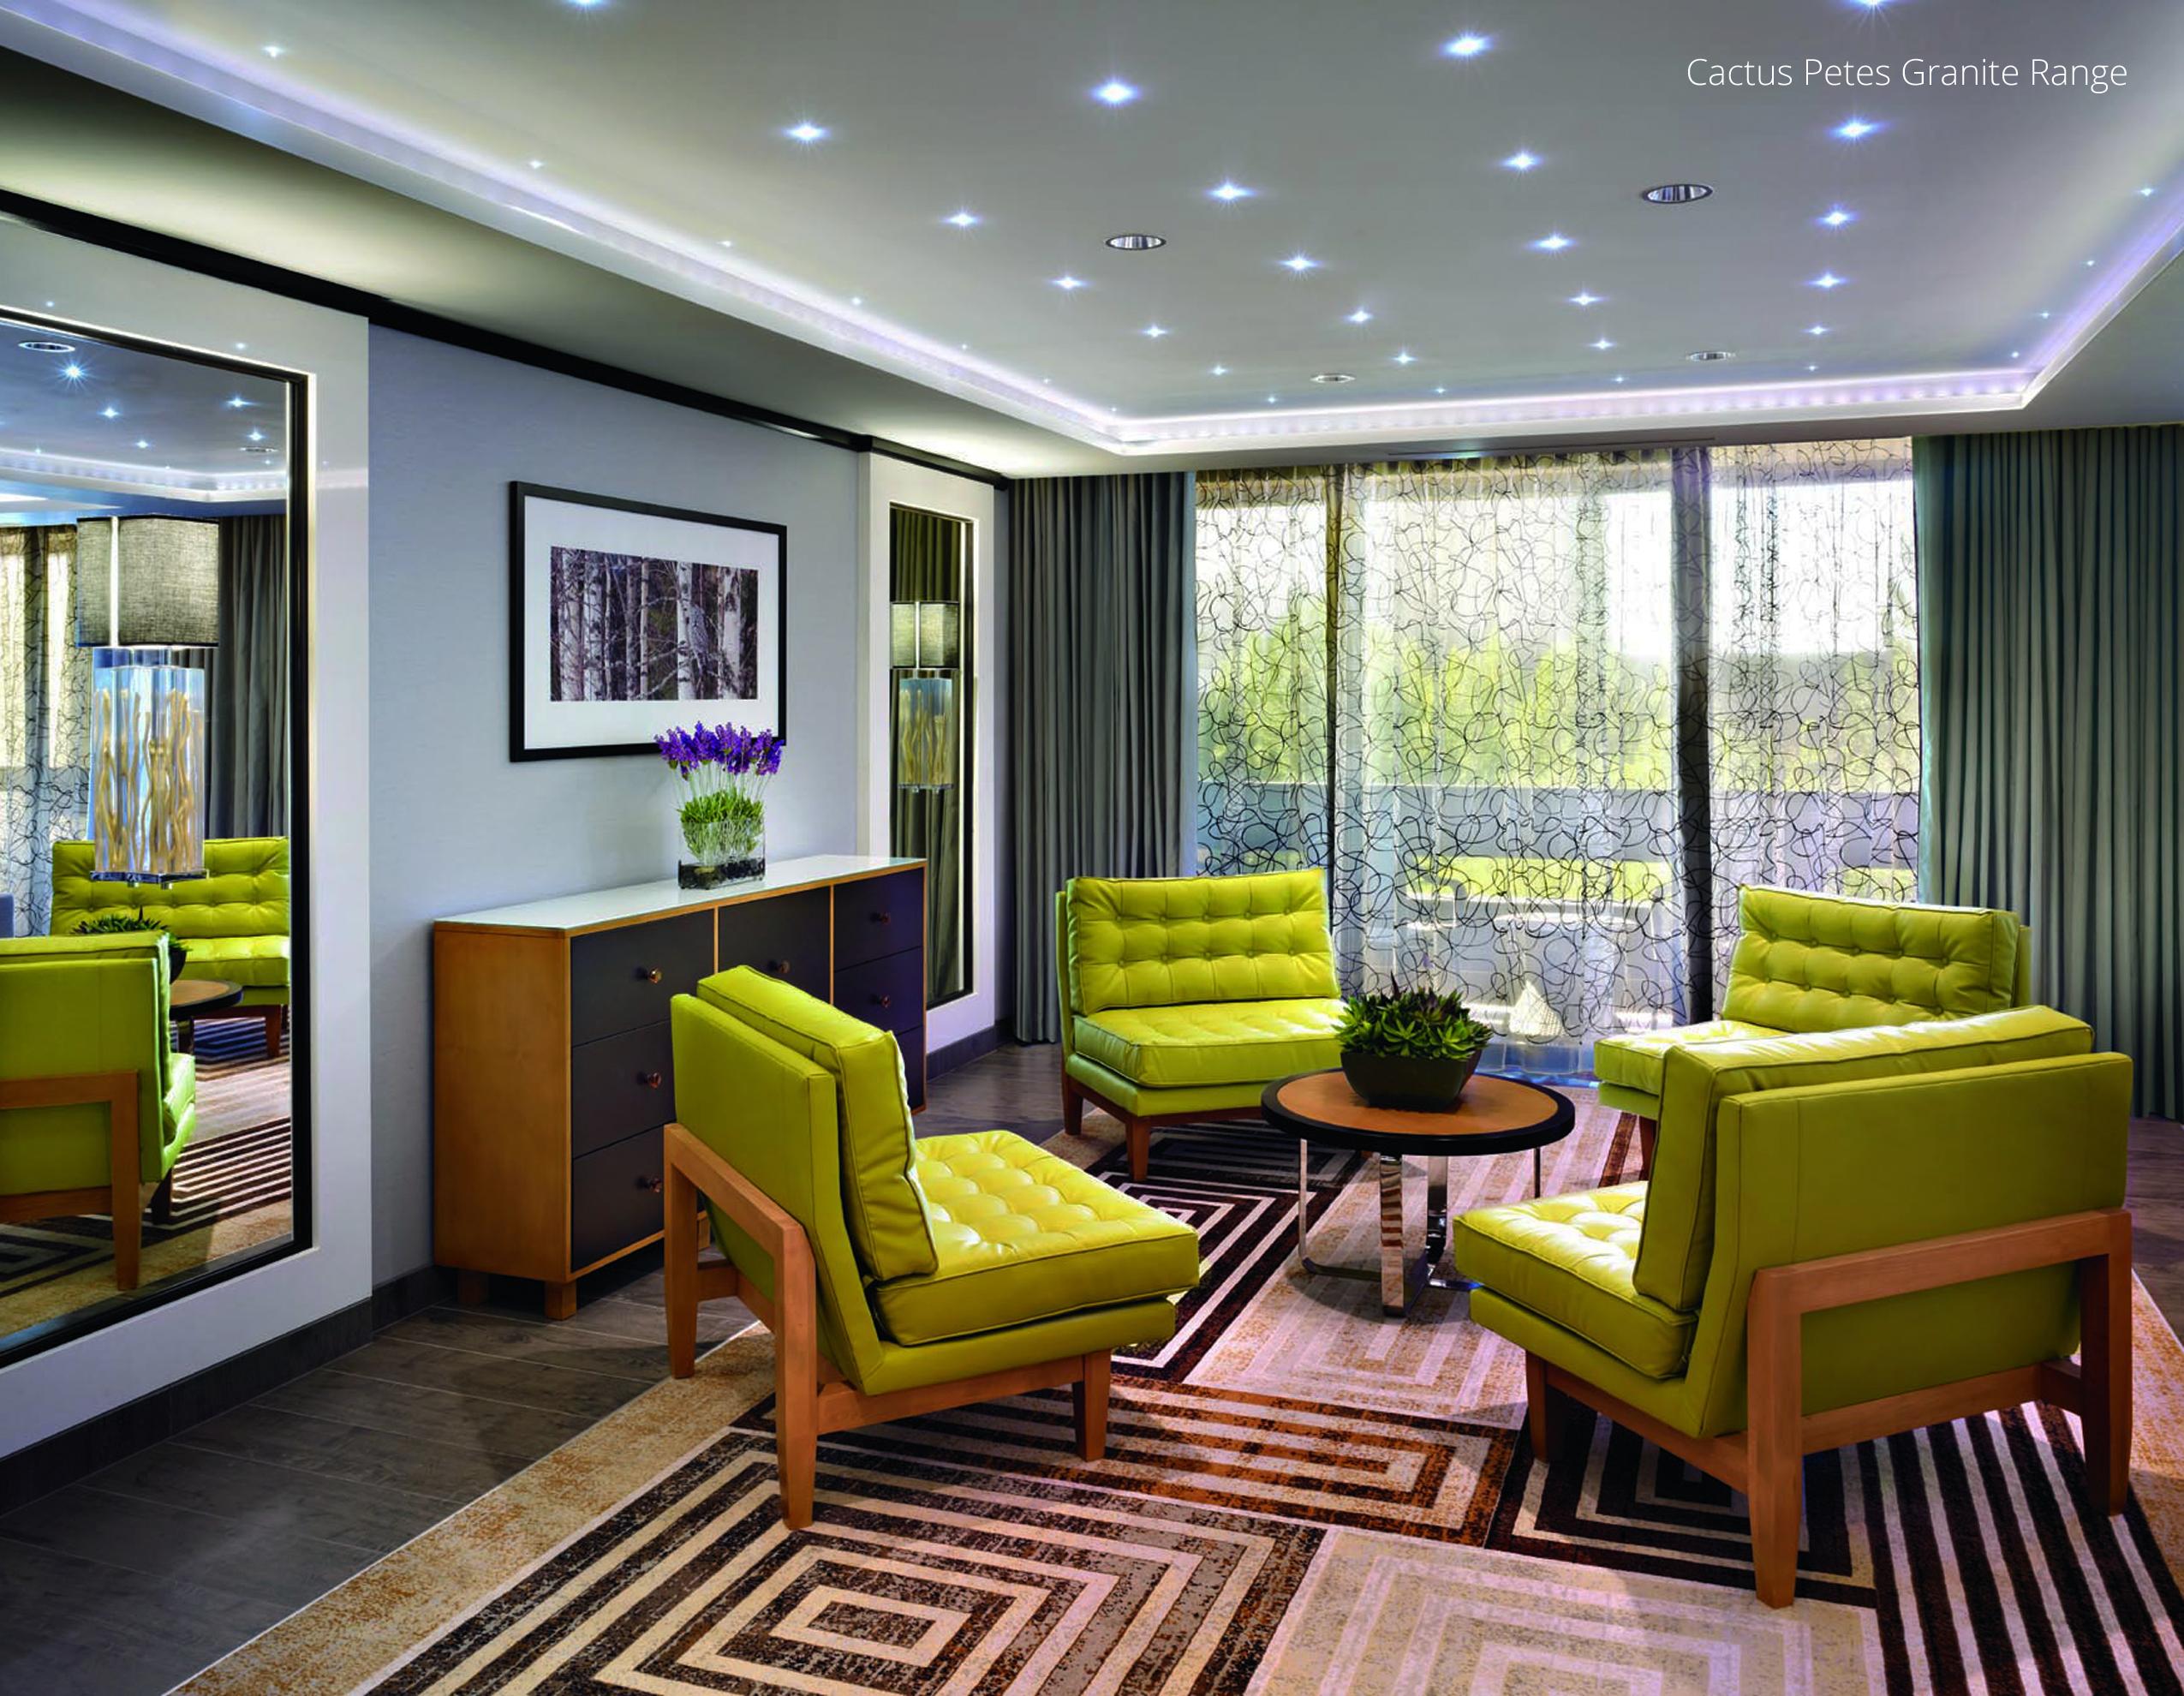 Cactus Petes Granite Range Hospitality Suite